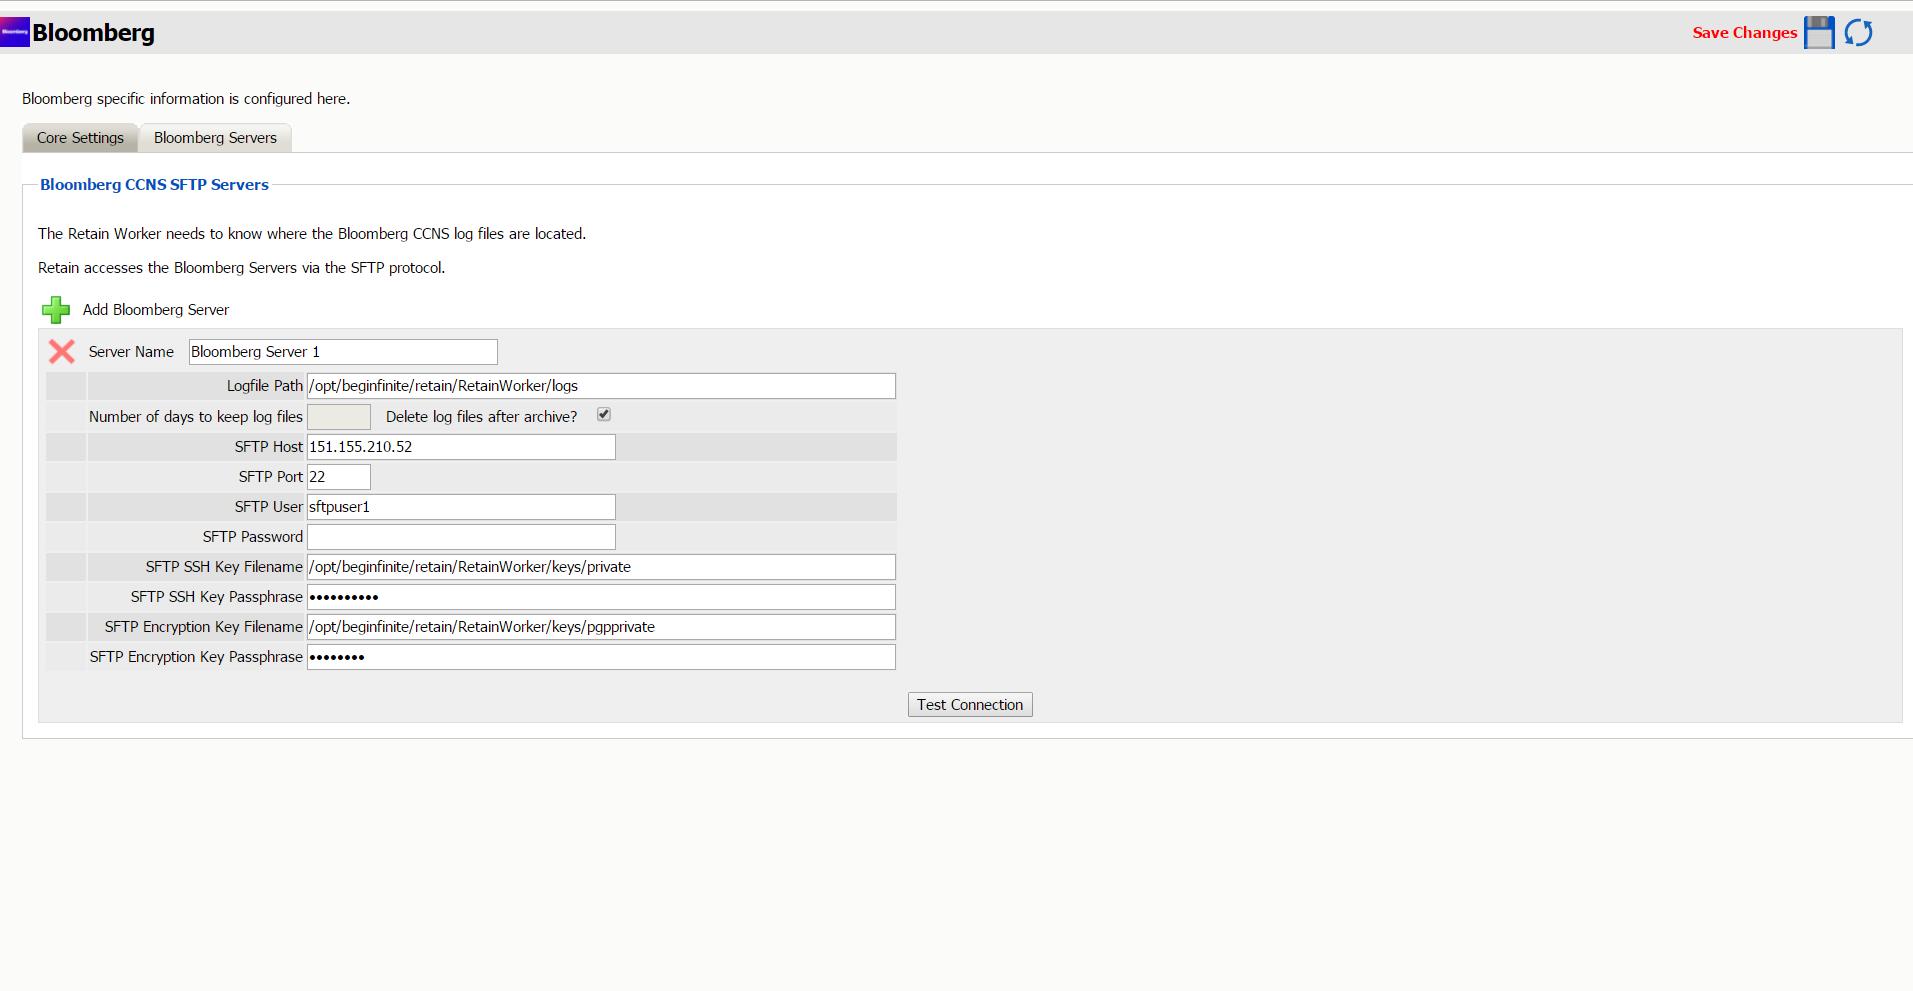 Module Configuration - Retain Version 4 2